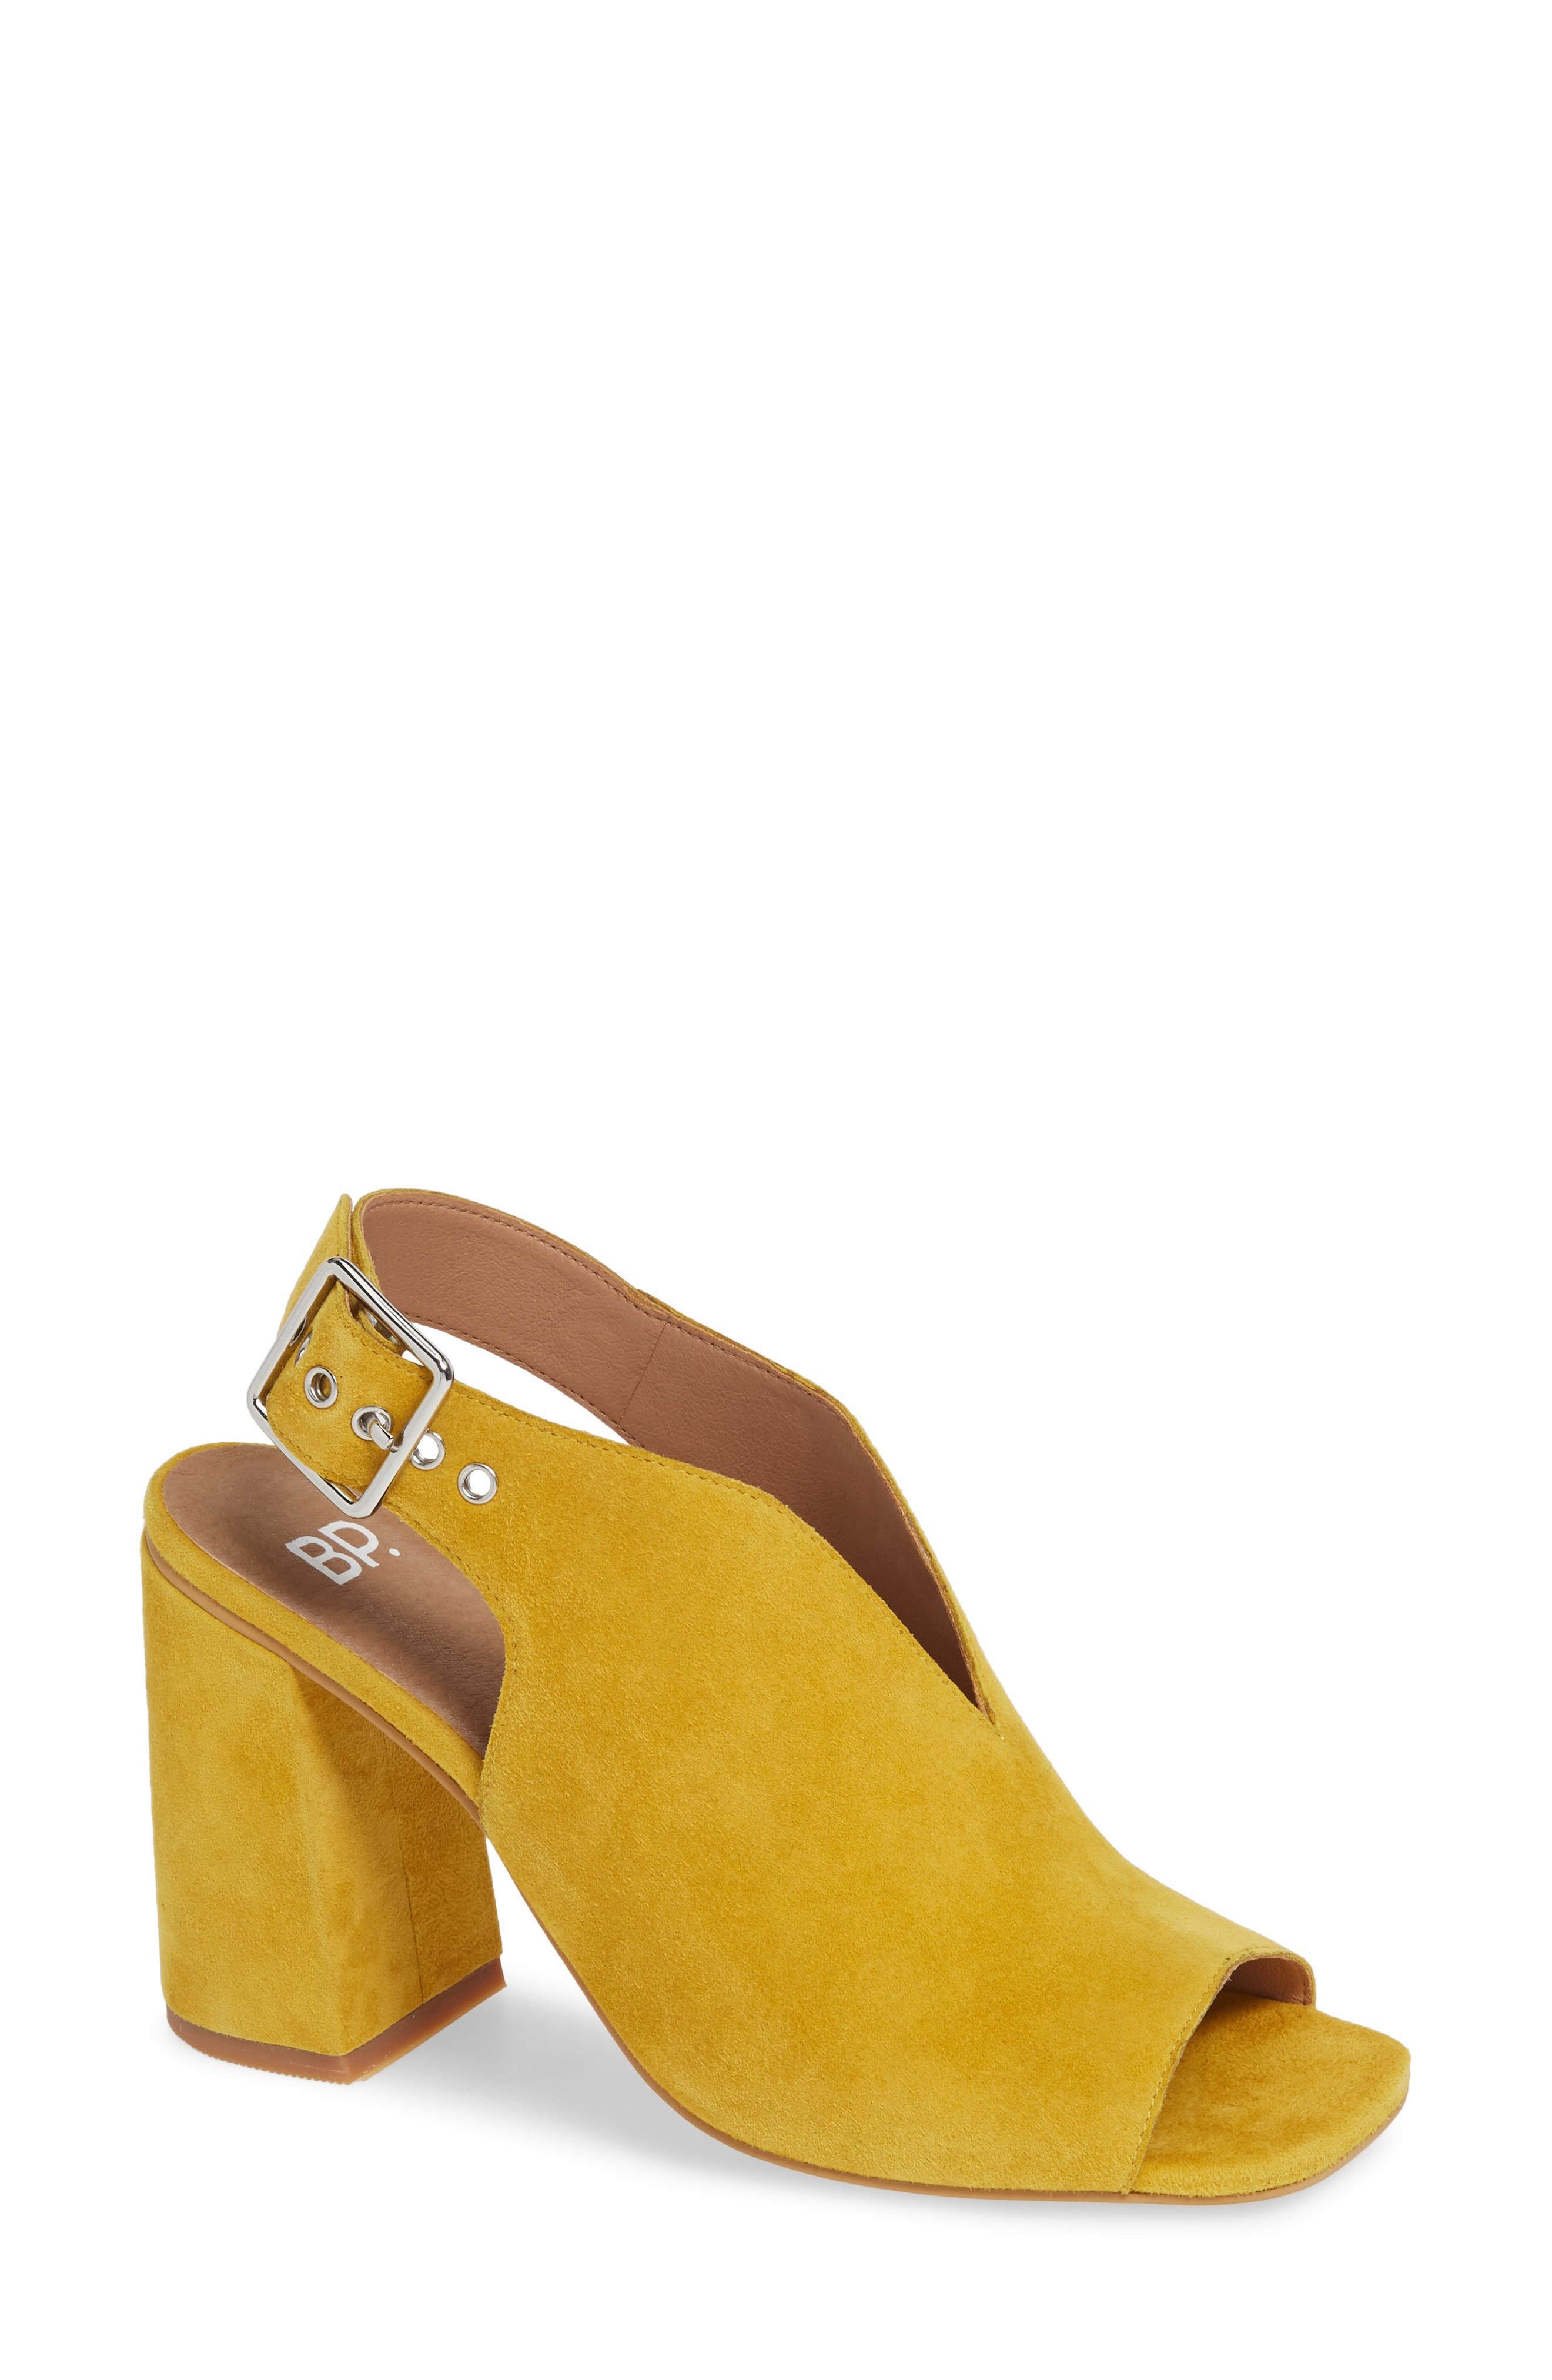 059f5cff3228 Bp. Block Heel Sandal